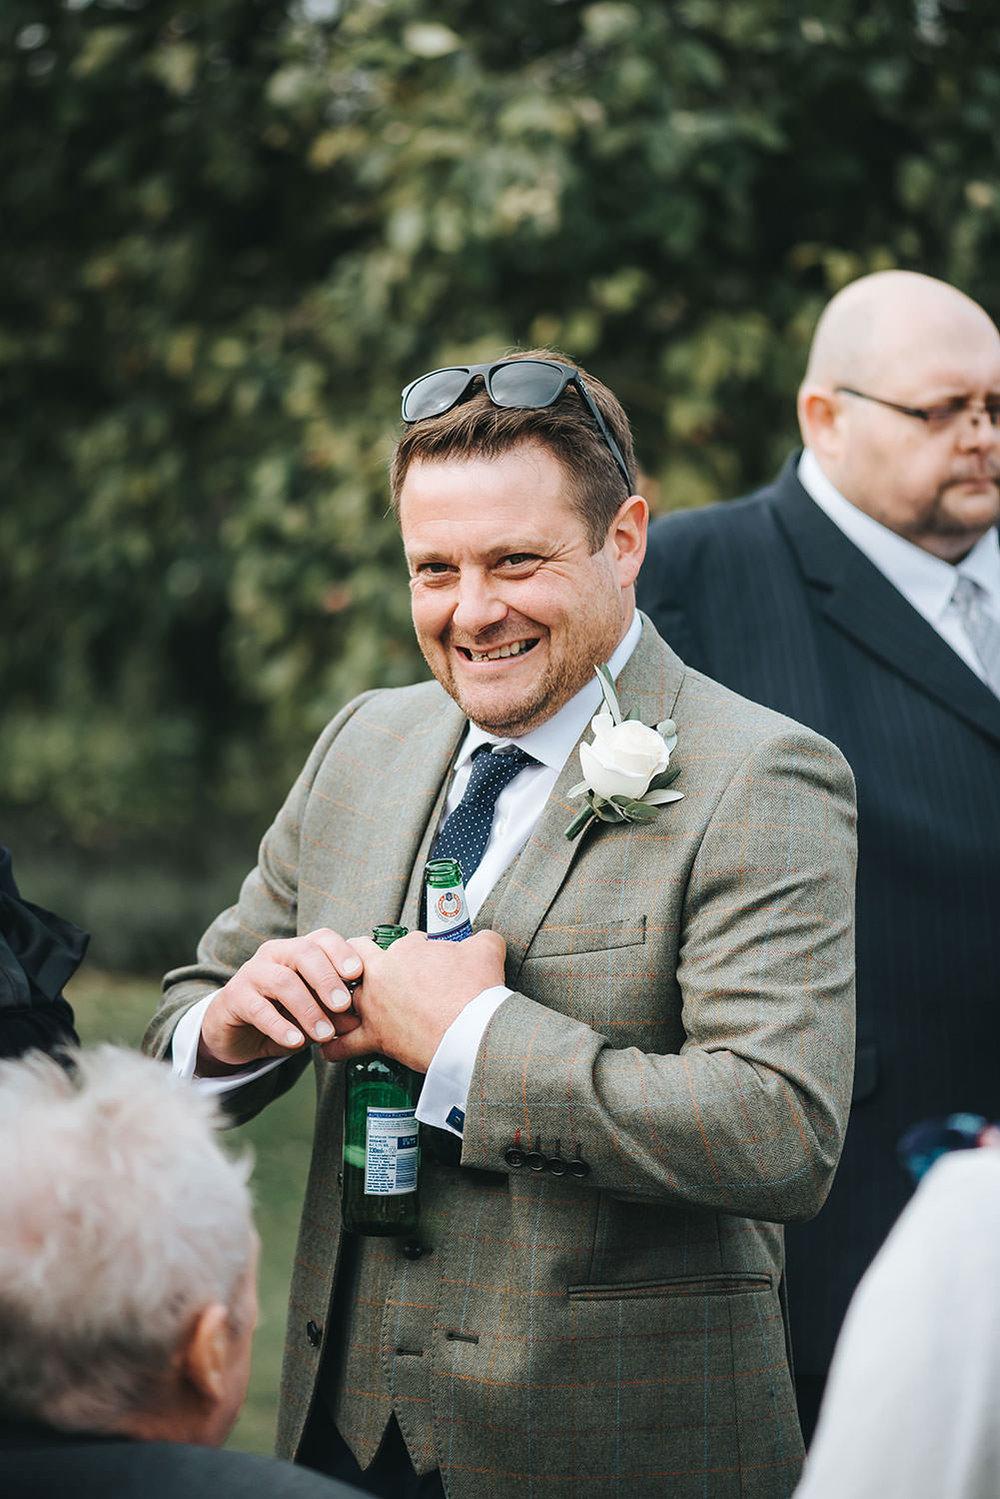 suffolk-wedding-photographer-helmingham-hall-48.jpg